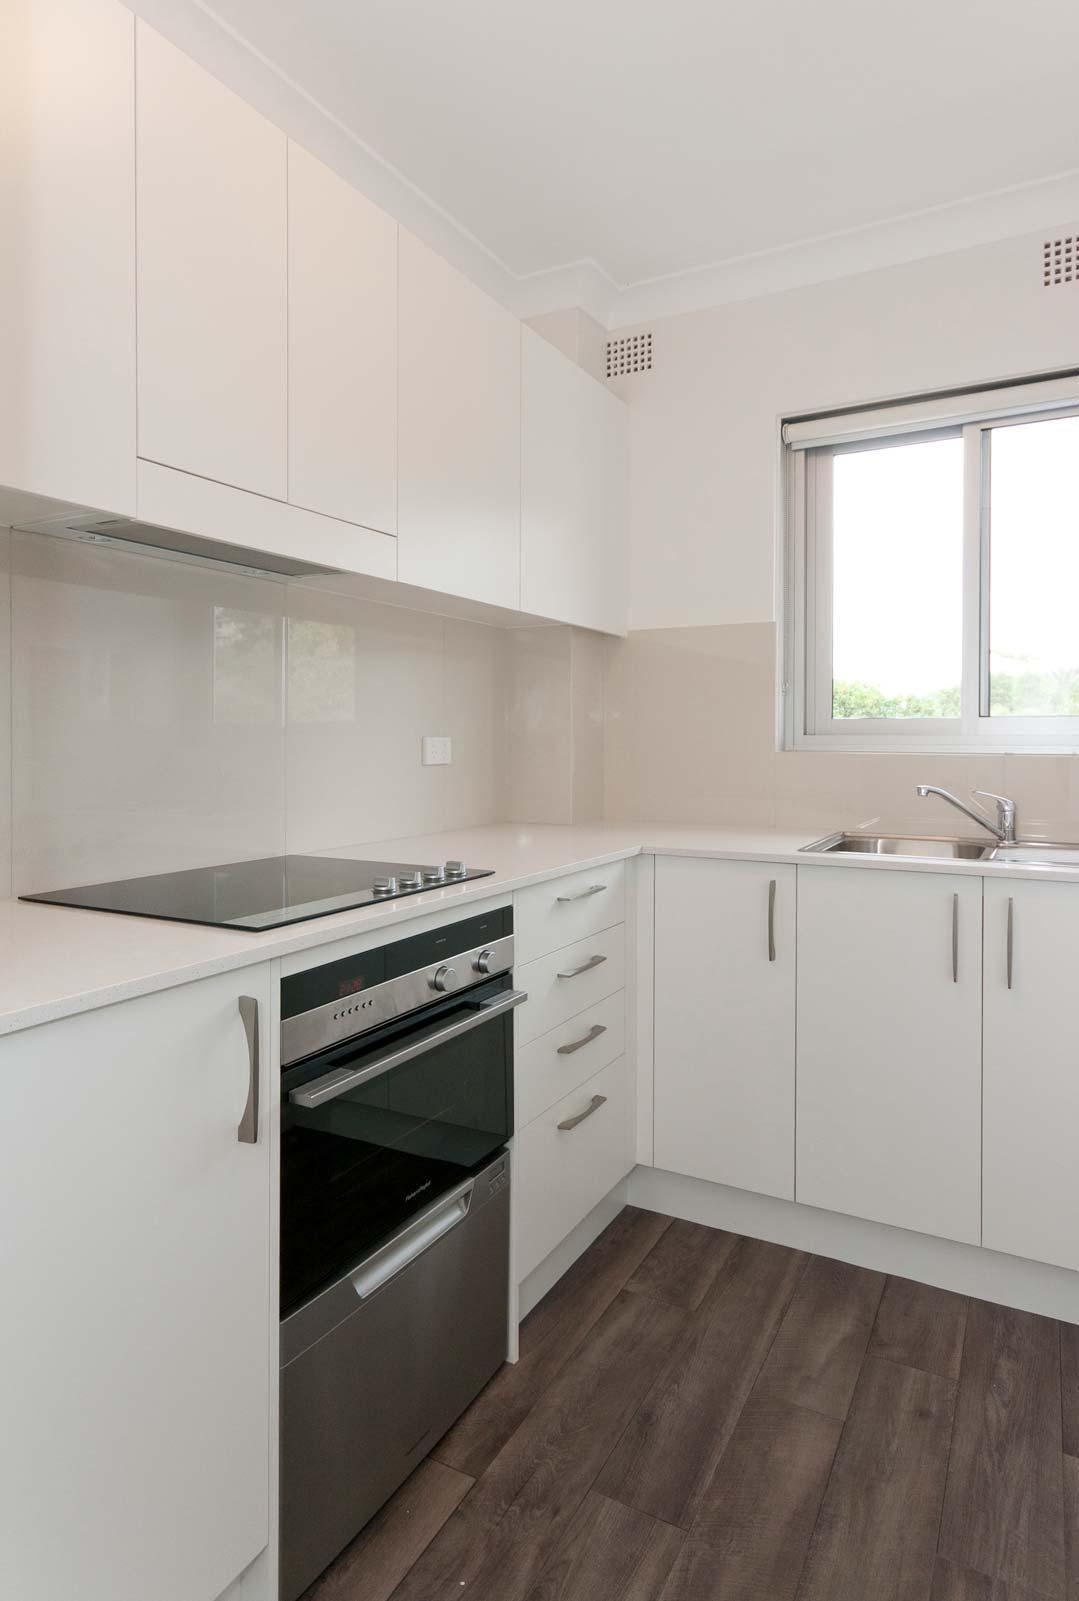 Apartment renovation Sydney unit renovation Collaroy, kitchen by Reno Pack